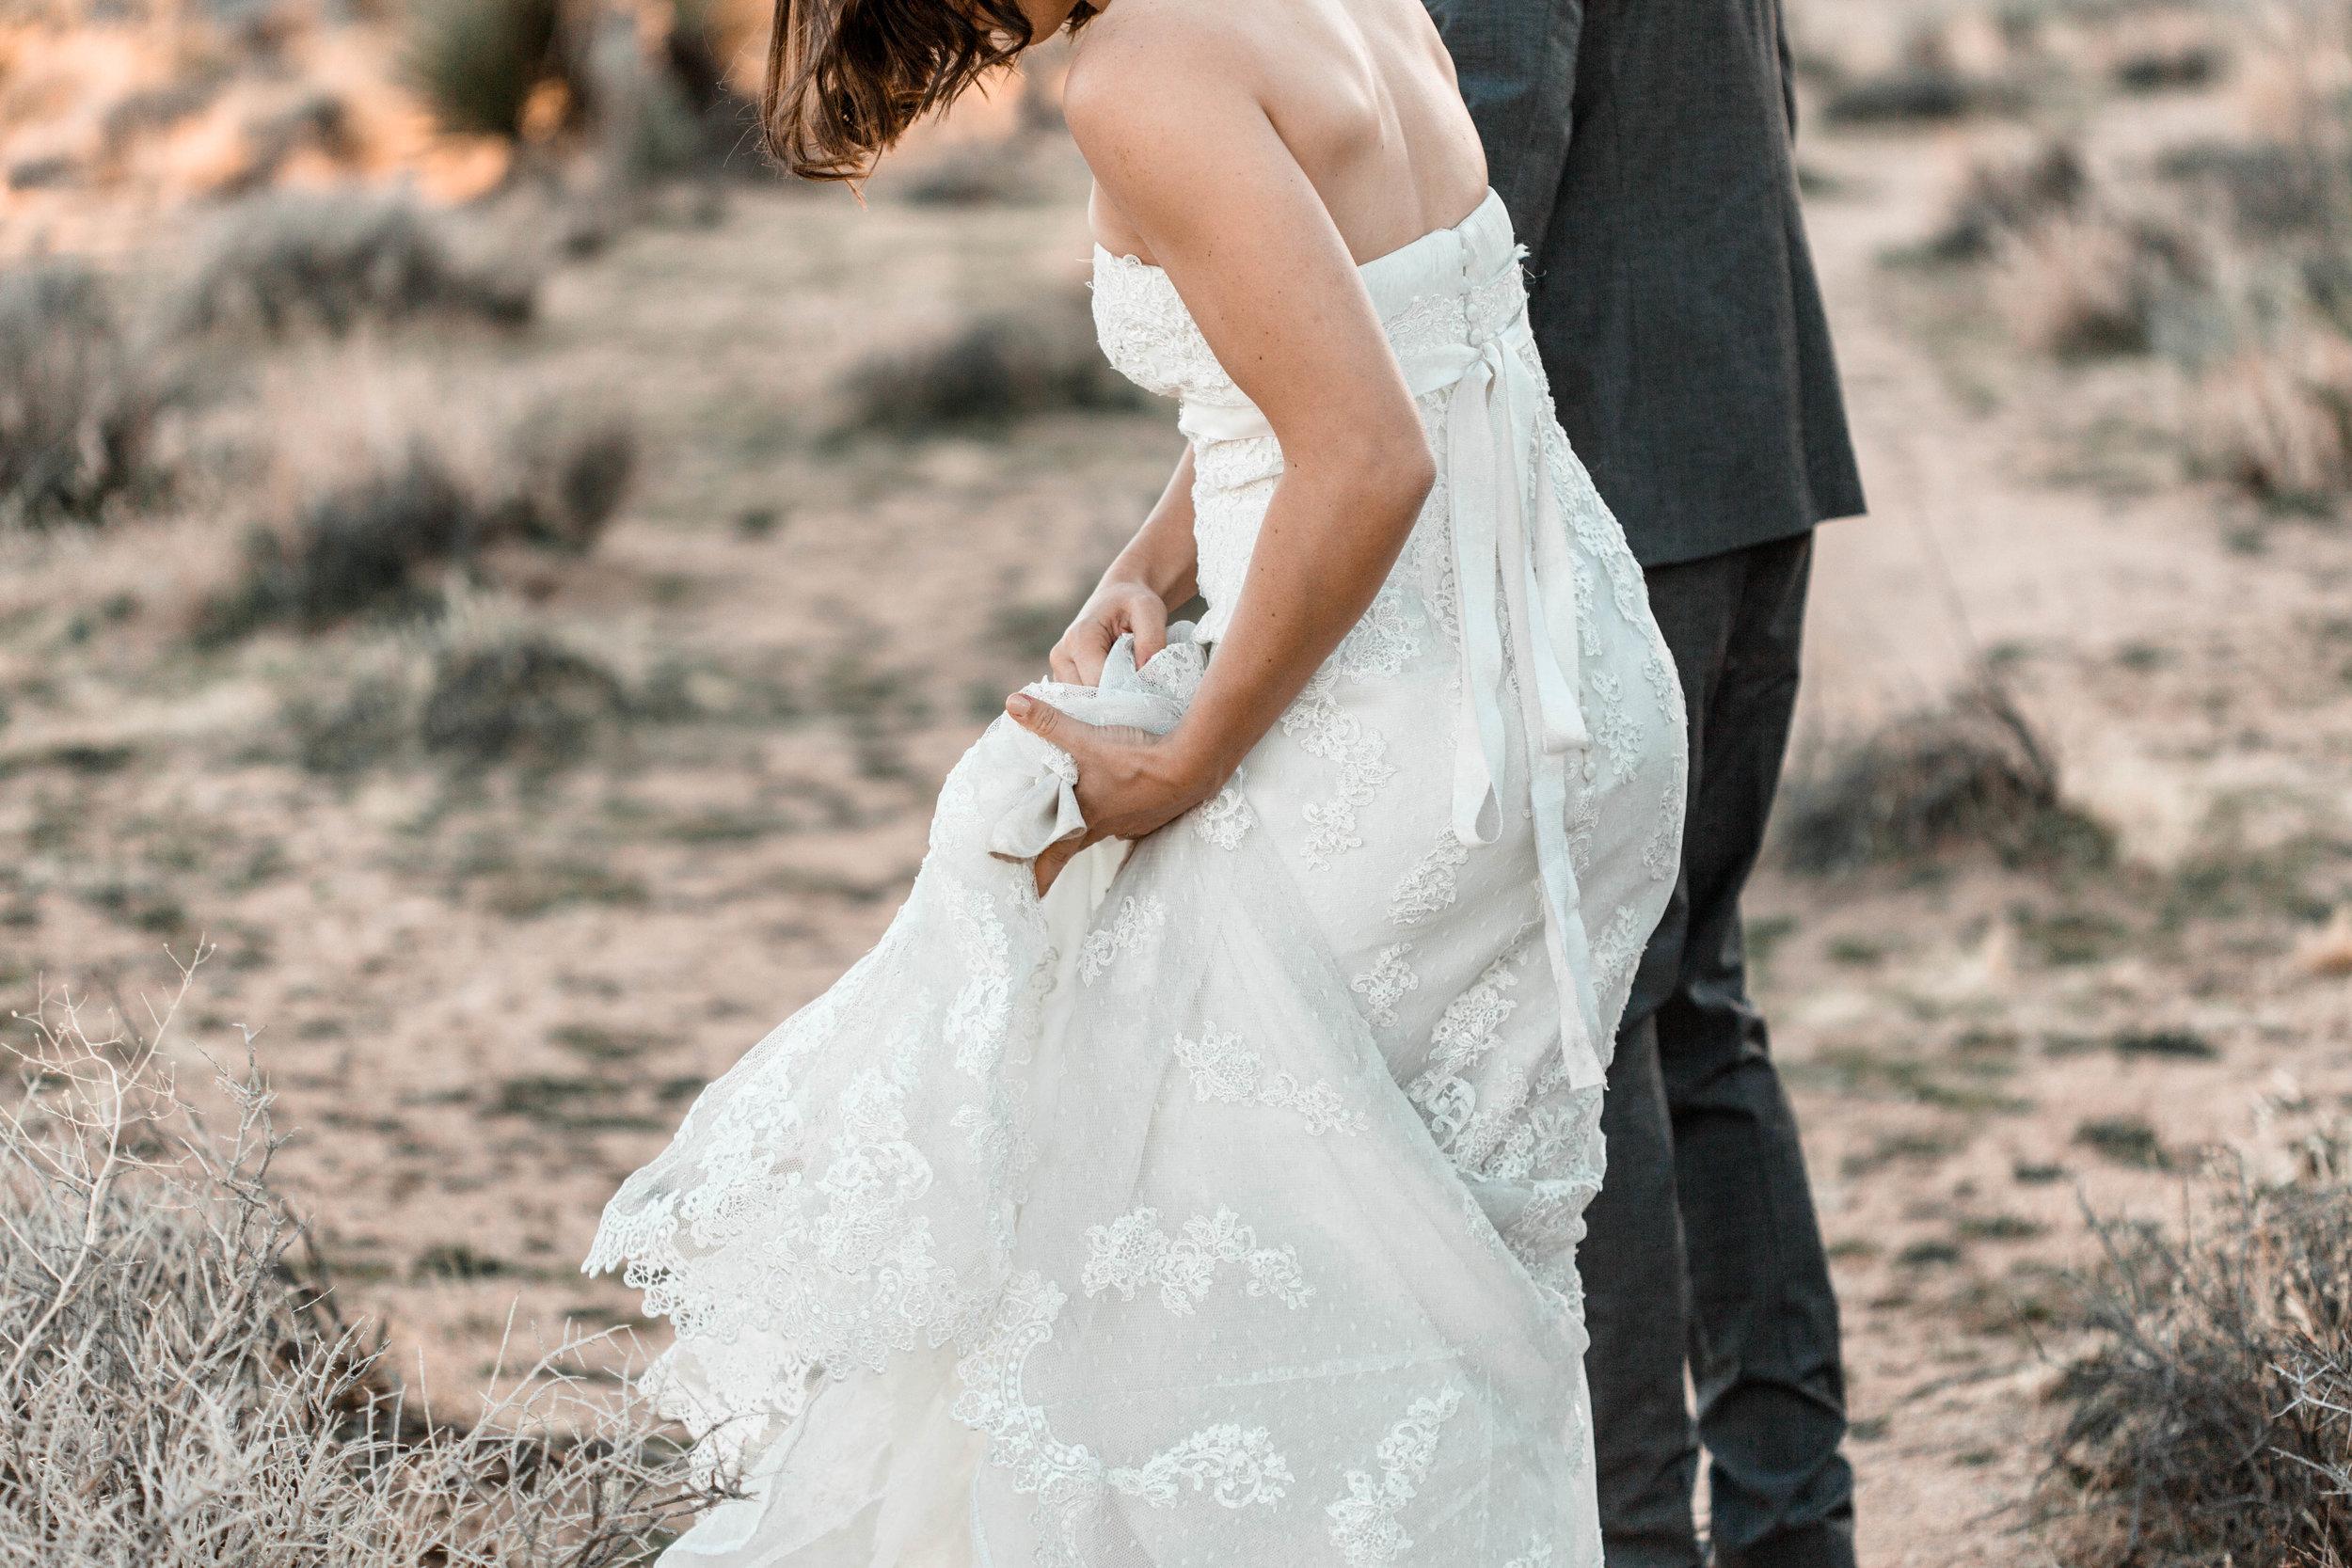 nicole-daacke-photography-joshua-tree-adventurous-elopement-wedding-national-park-wedding-photographer-adventure-wedding-adventurous-elopement-jtree-joshua-tree-national-park-wedding-photographer-intimate-weddings-golden-desert-love-21.jpg